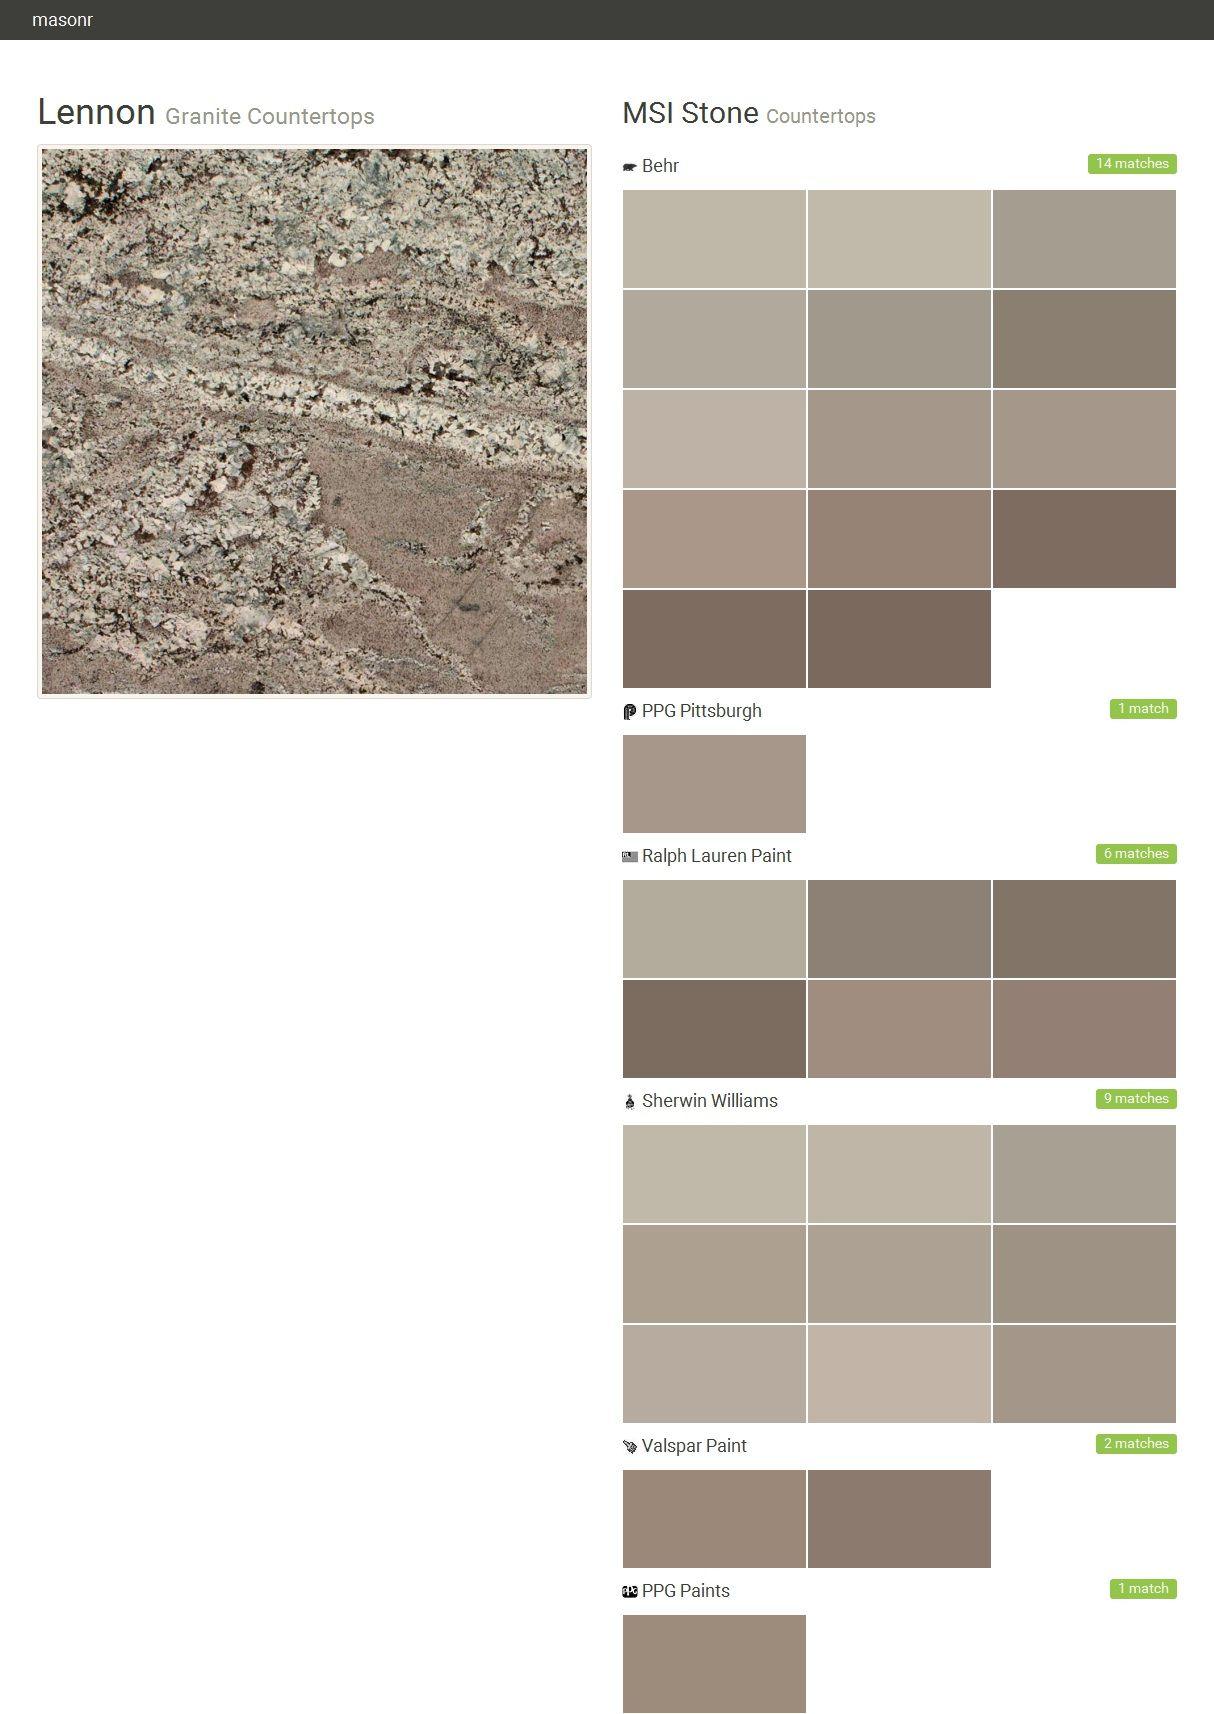 Granite Countertops. Countertops. MSI Stone. Behr. PPG Pittsburgh. Ralph